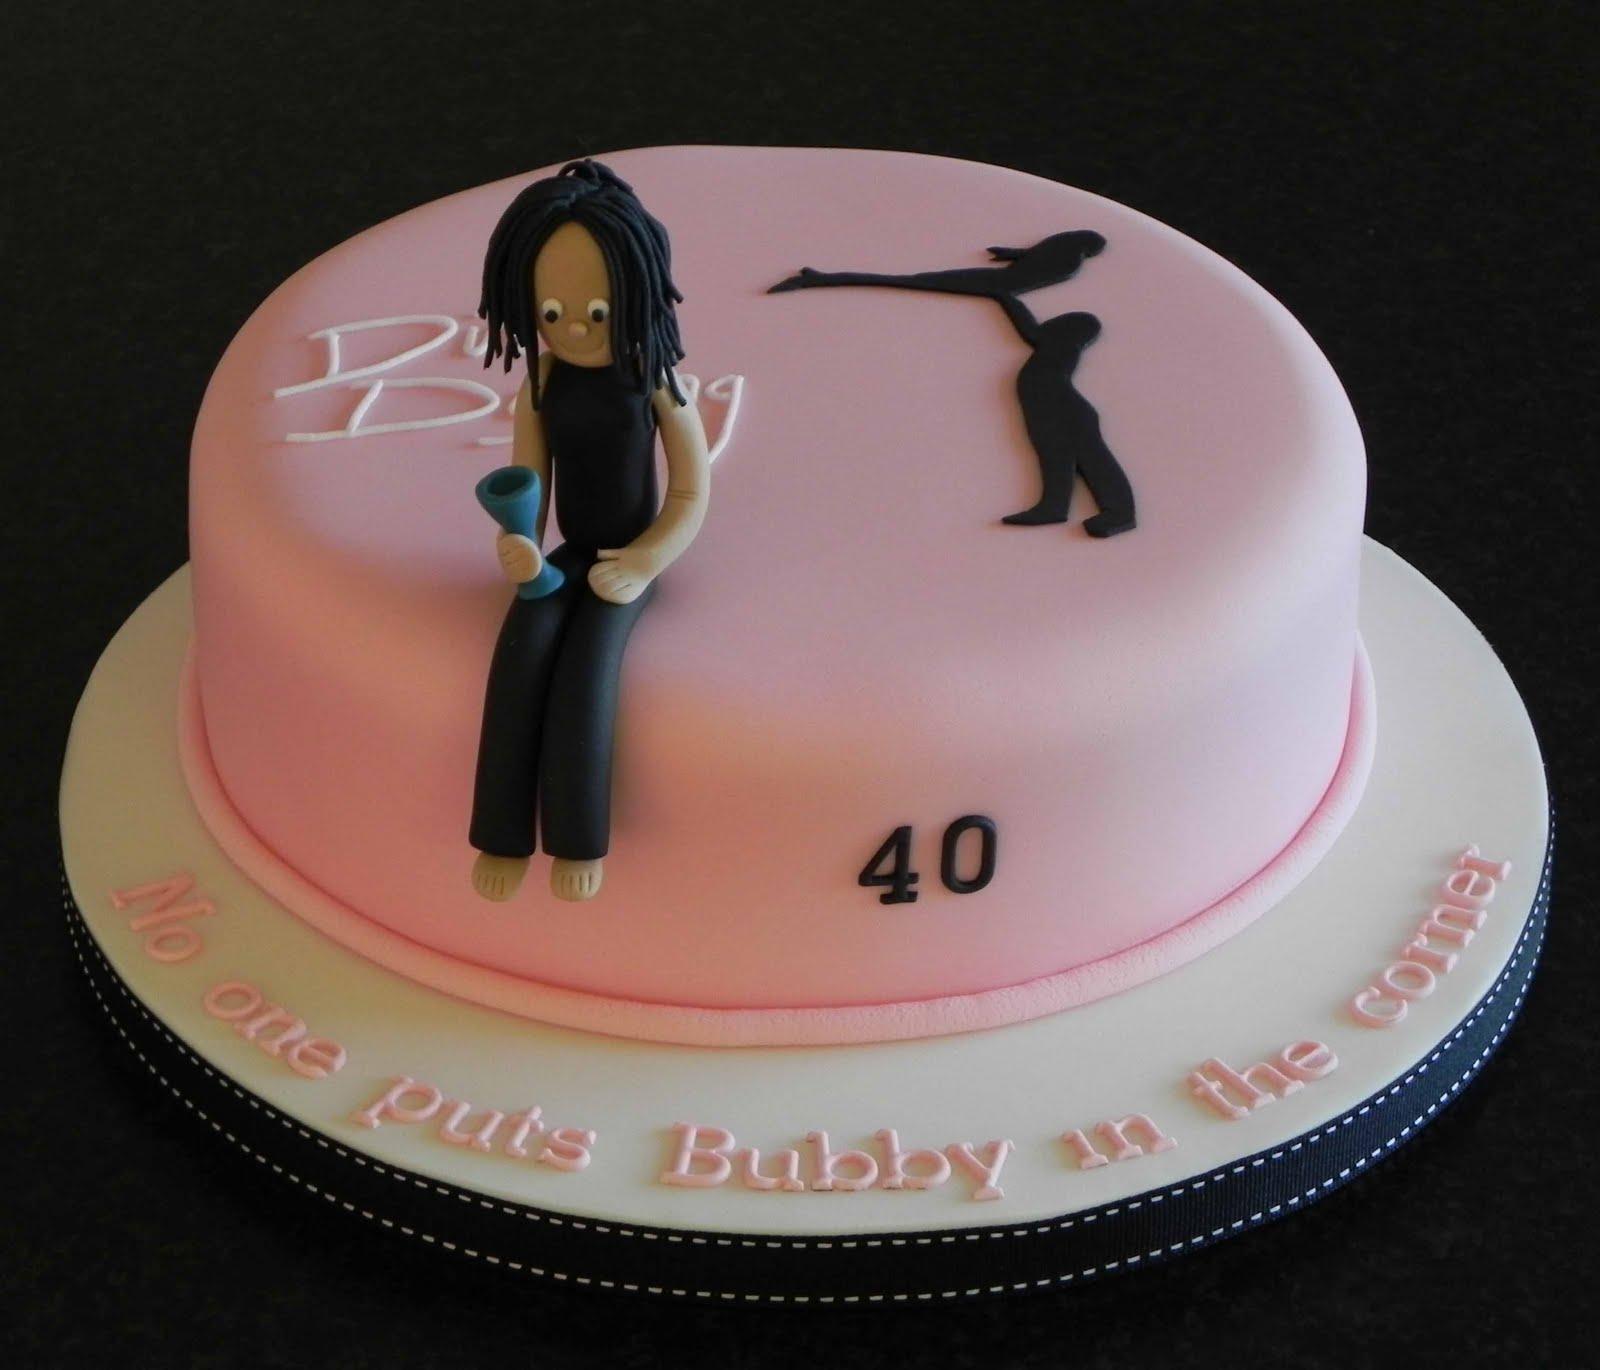 dirty birthday cake - photo #11